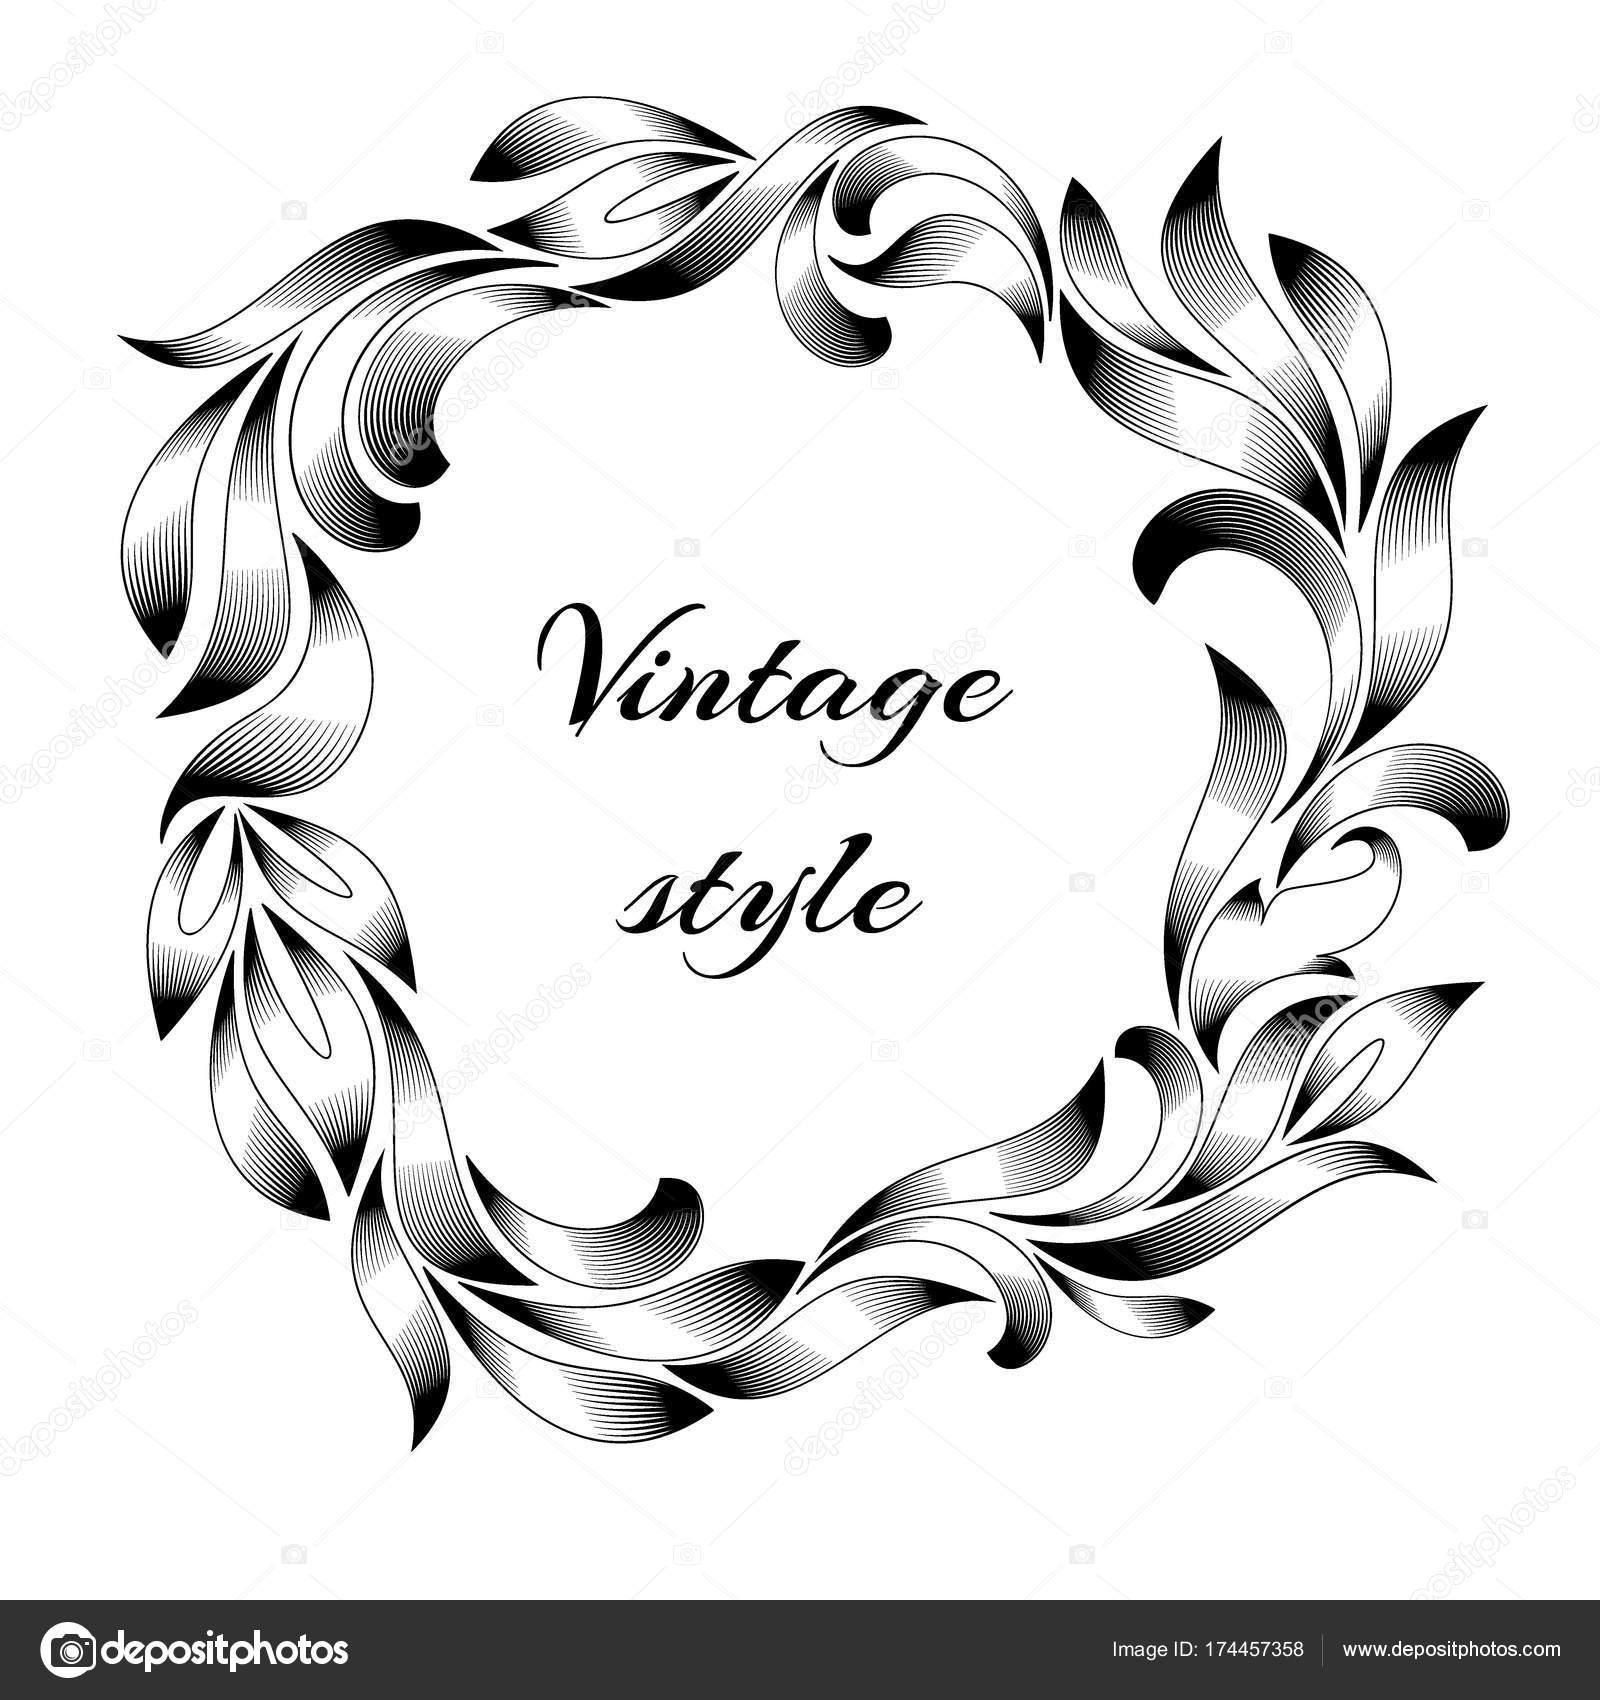 Vintage Rahmen Gravur mit Retro-Ornament-Muster im Antikstil floral ...